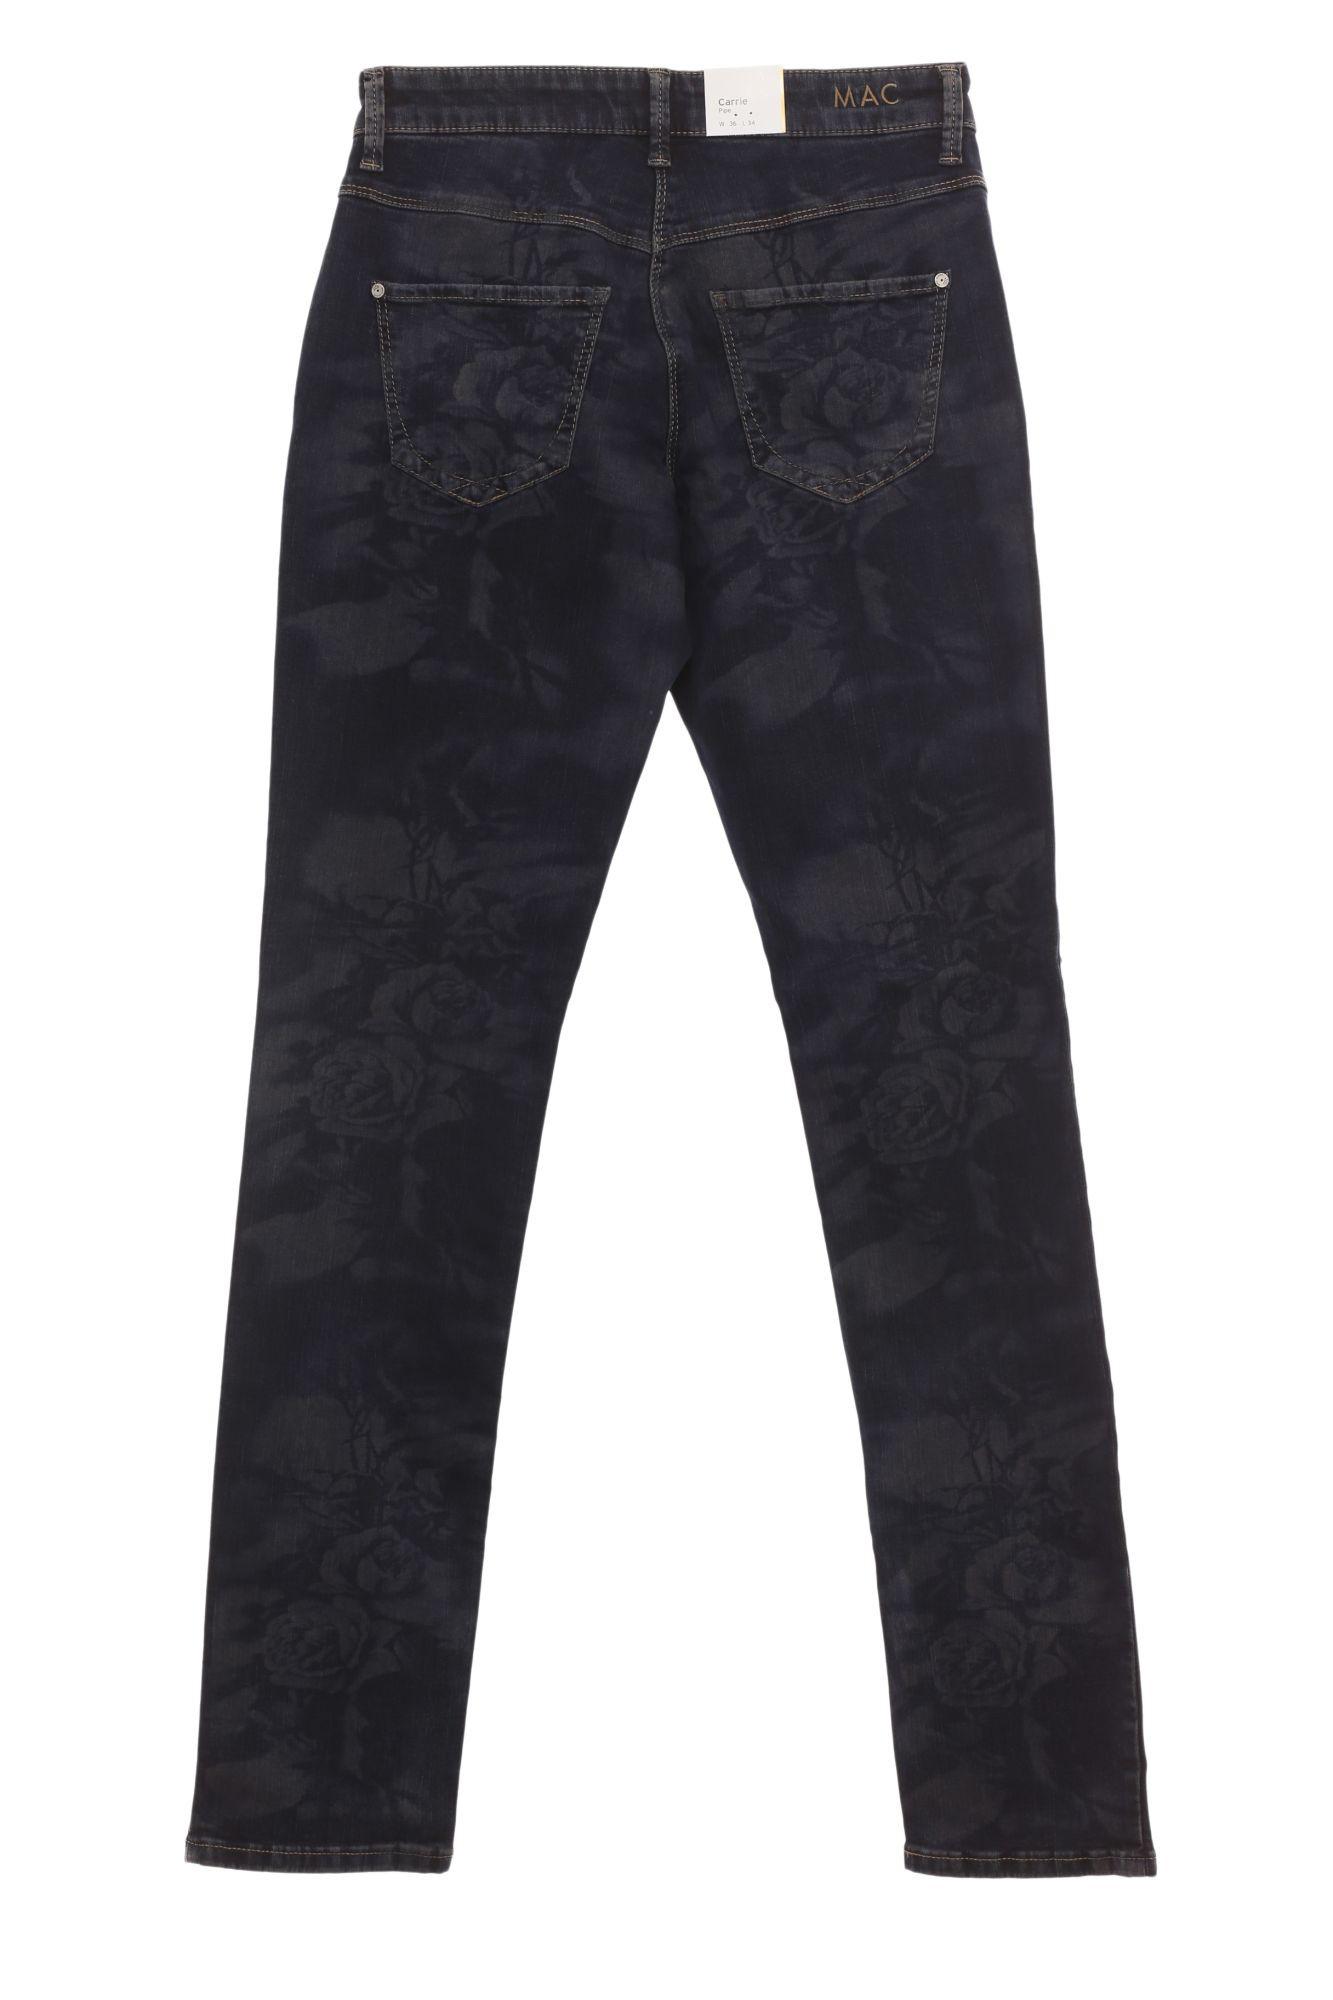 mac jeans carrie pipe damen stretch ebay. Black Bedroom Furniture Sets. Home Design Ideas